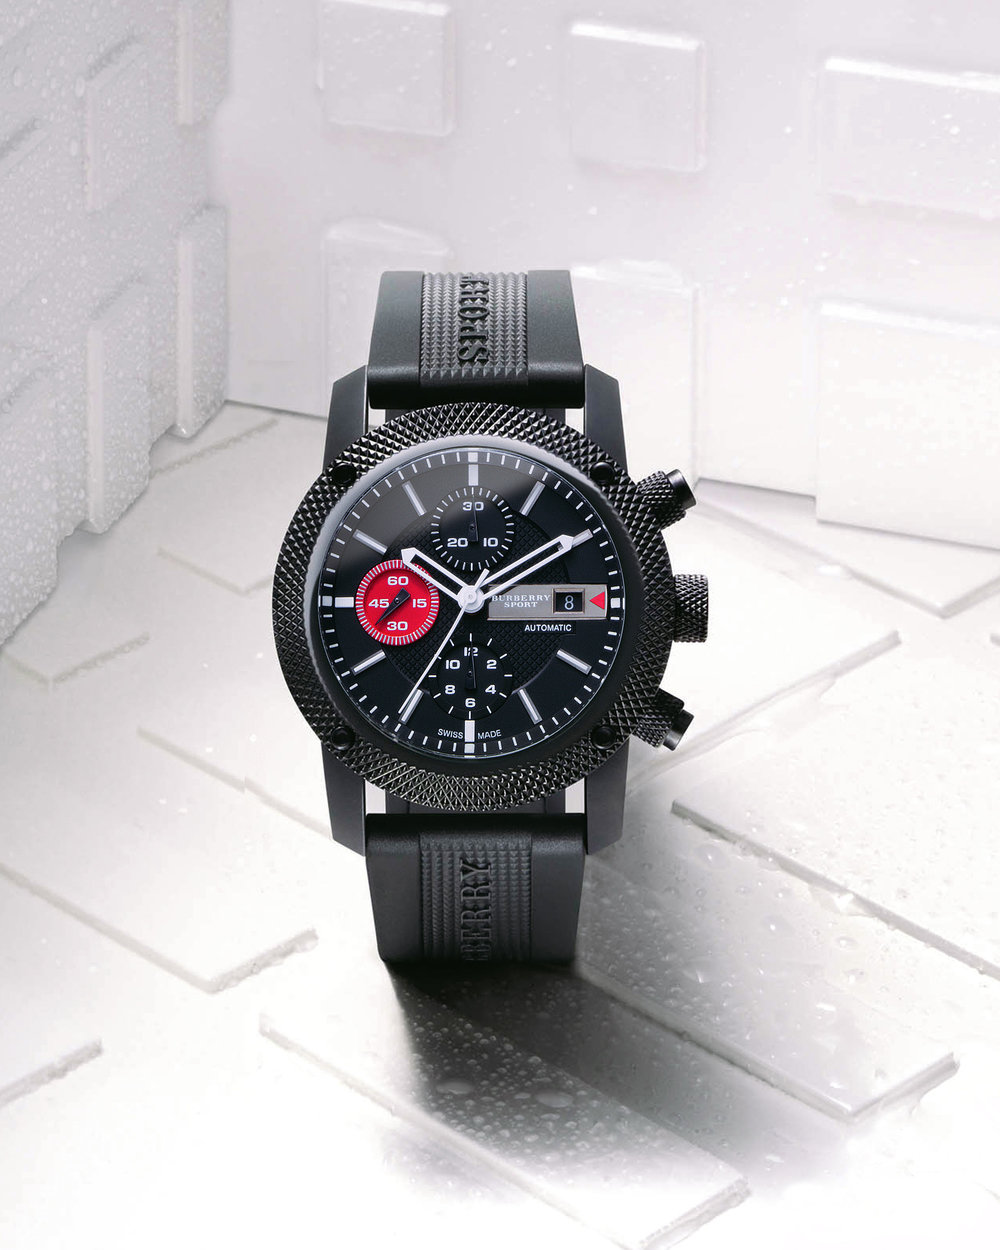 Burberry Sports Watch 1 RGB F4-2.jpg